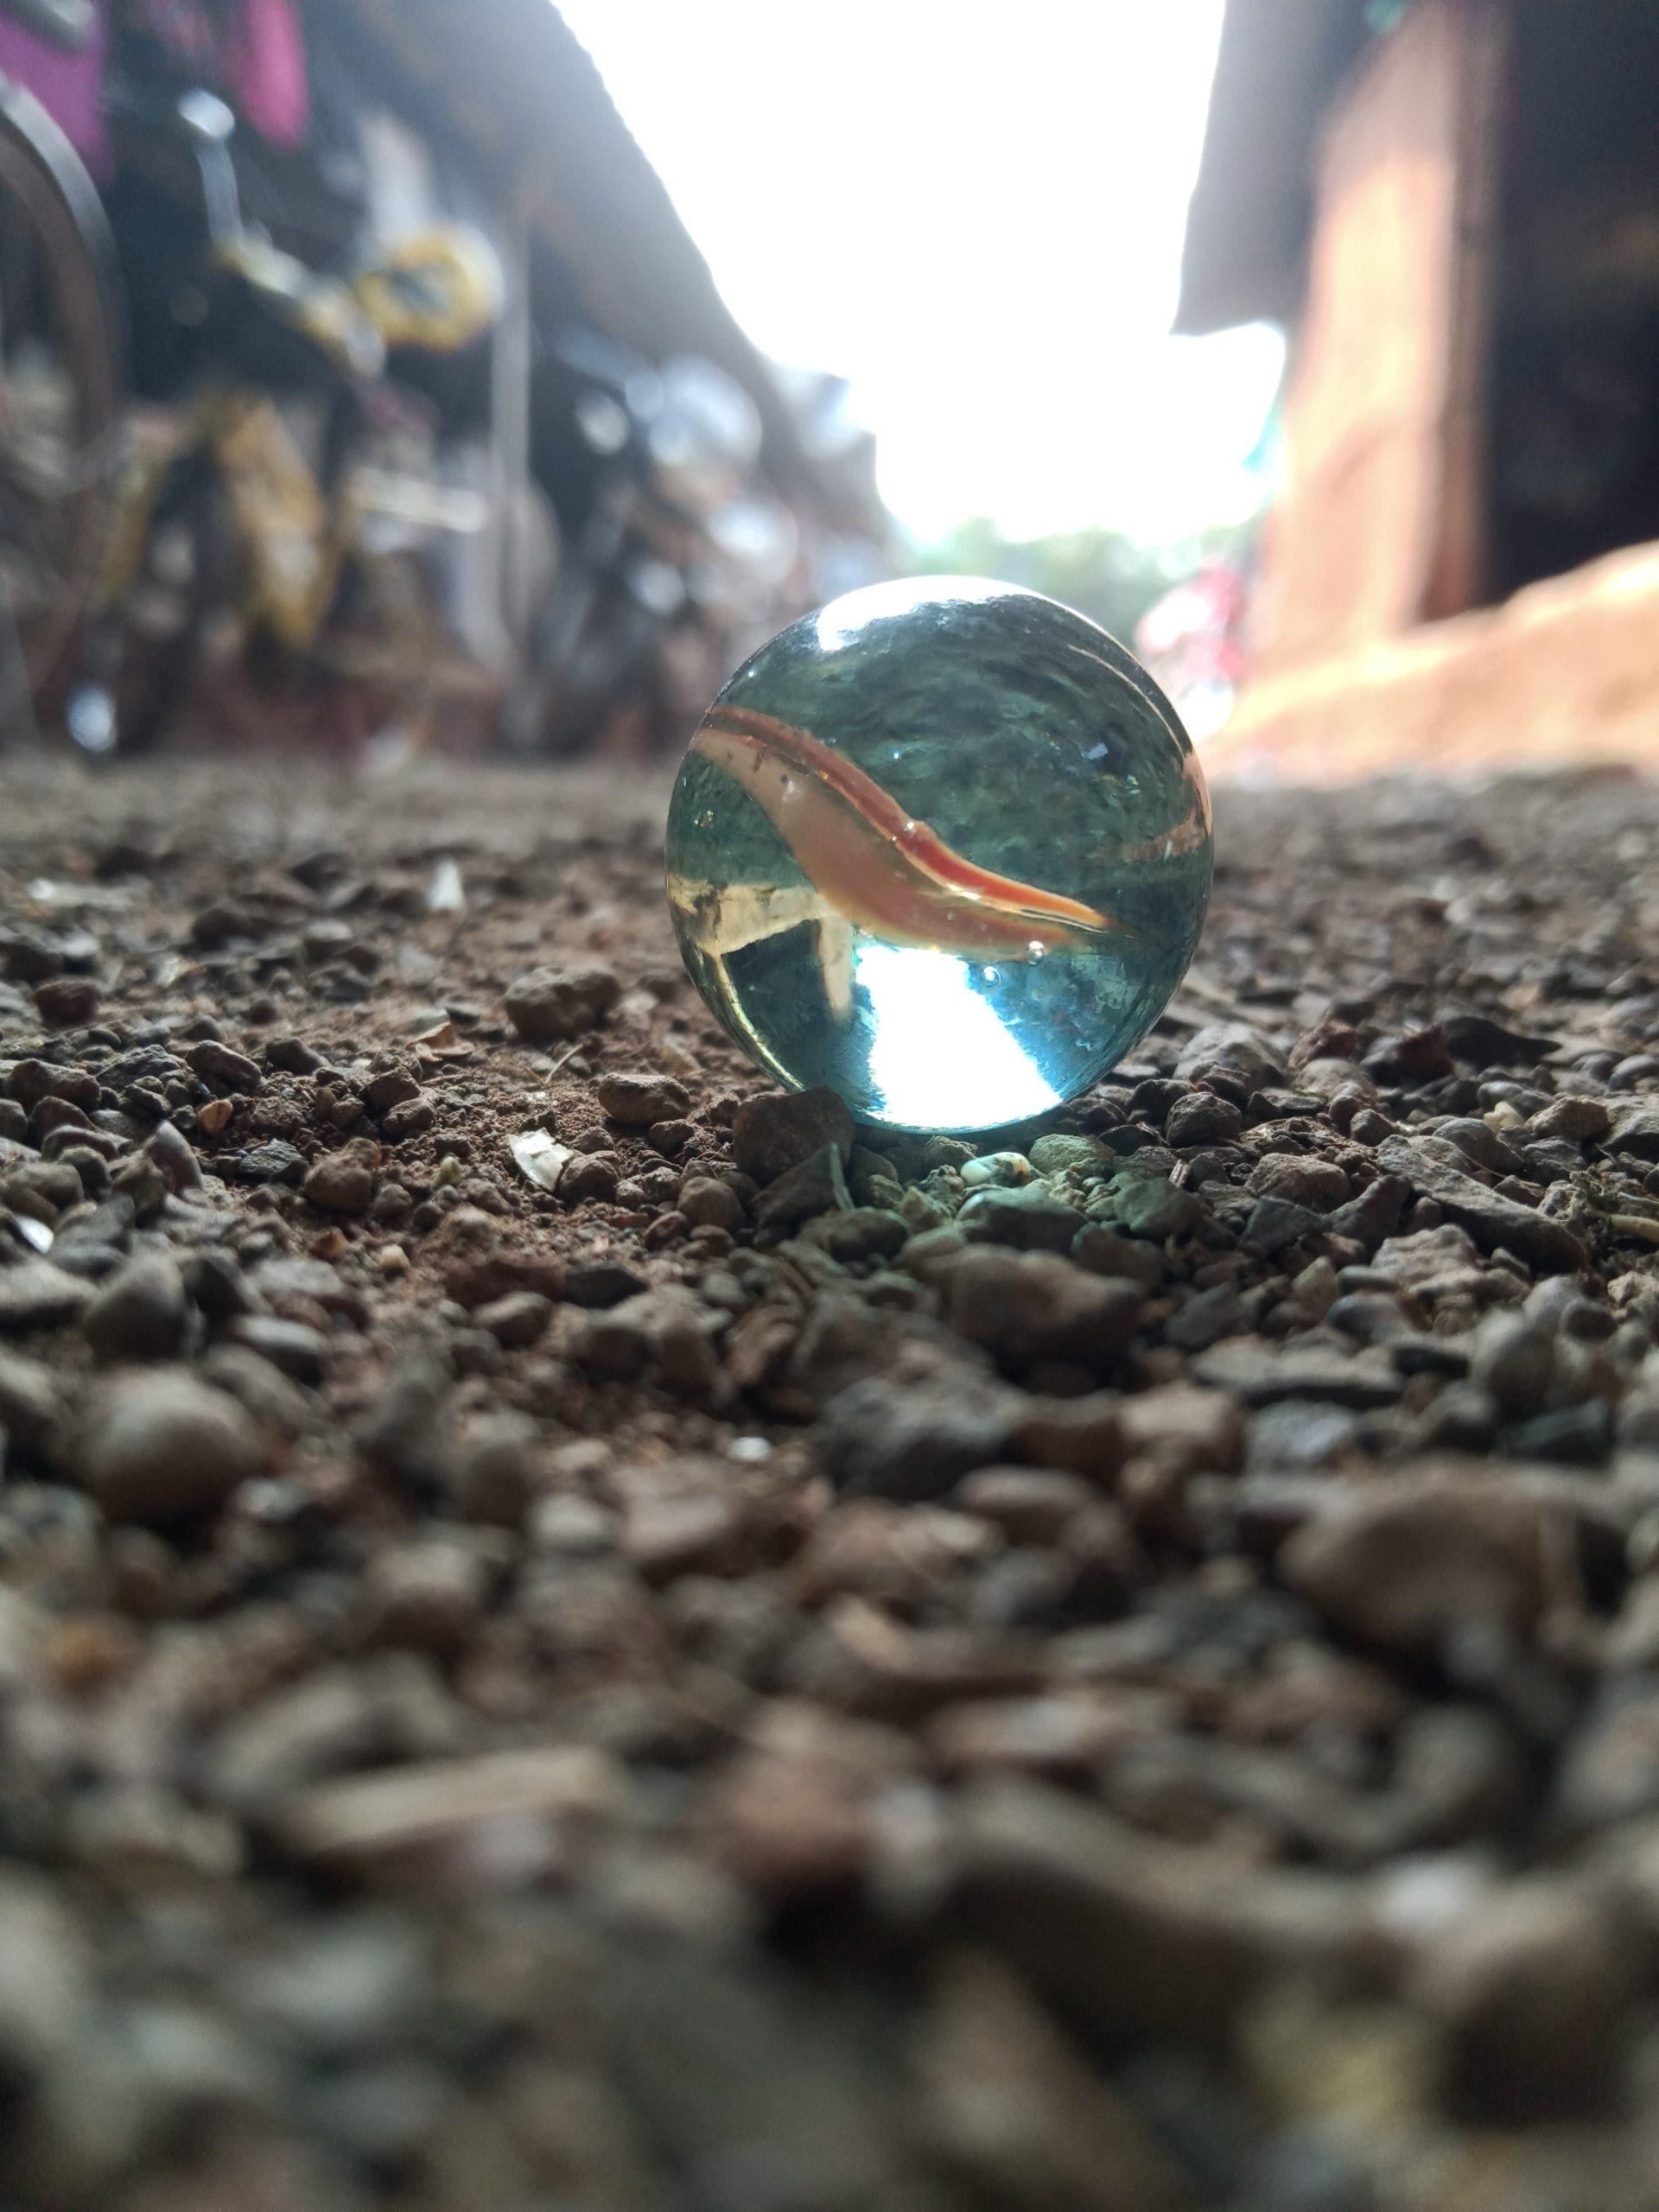 A marble ball